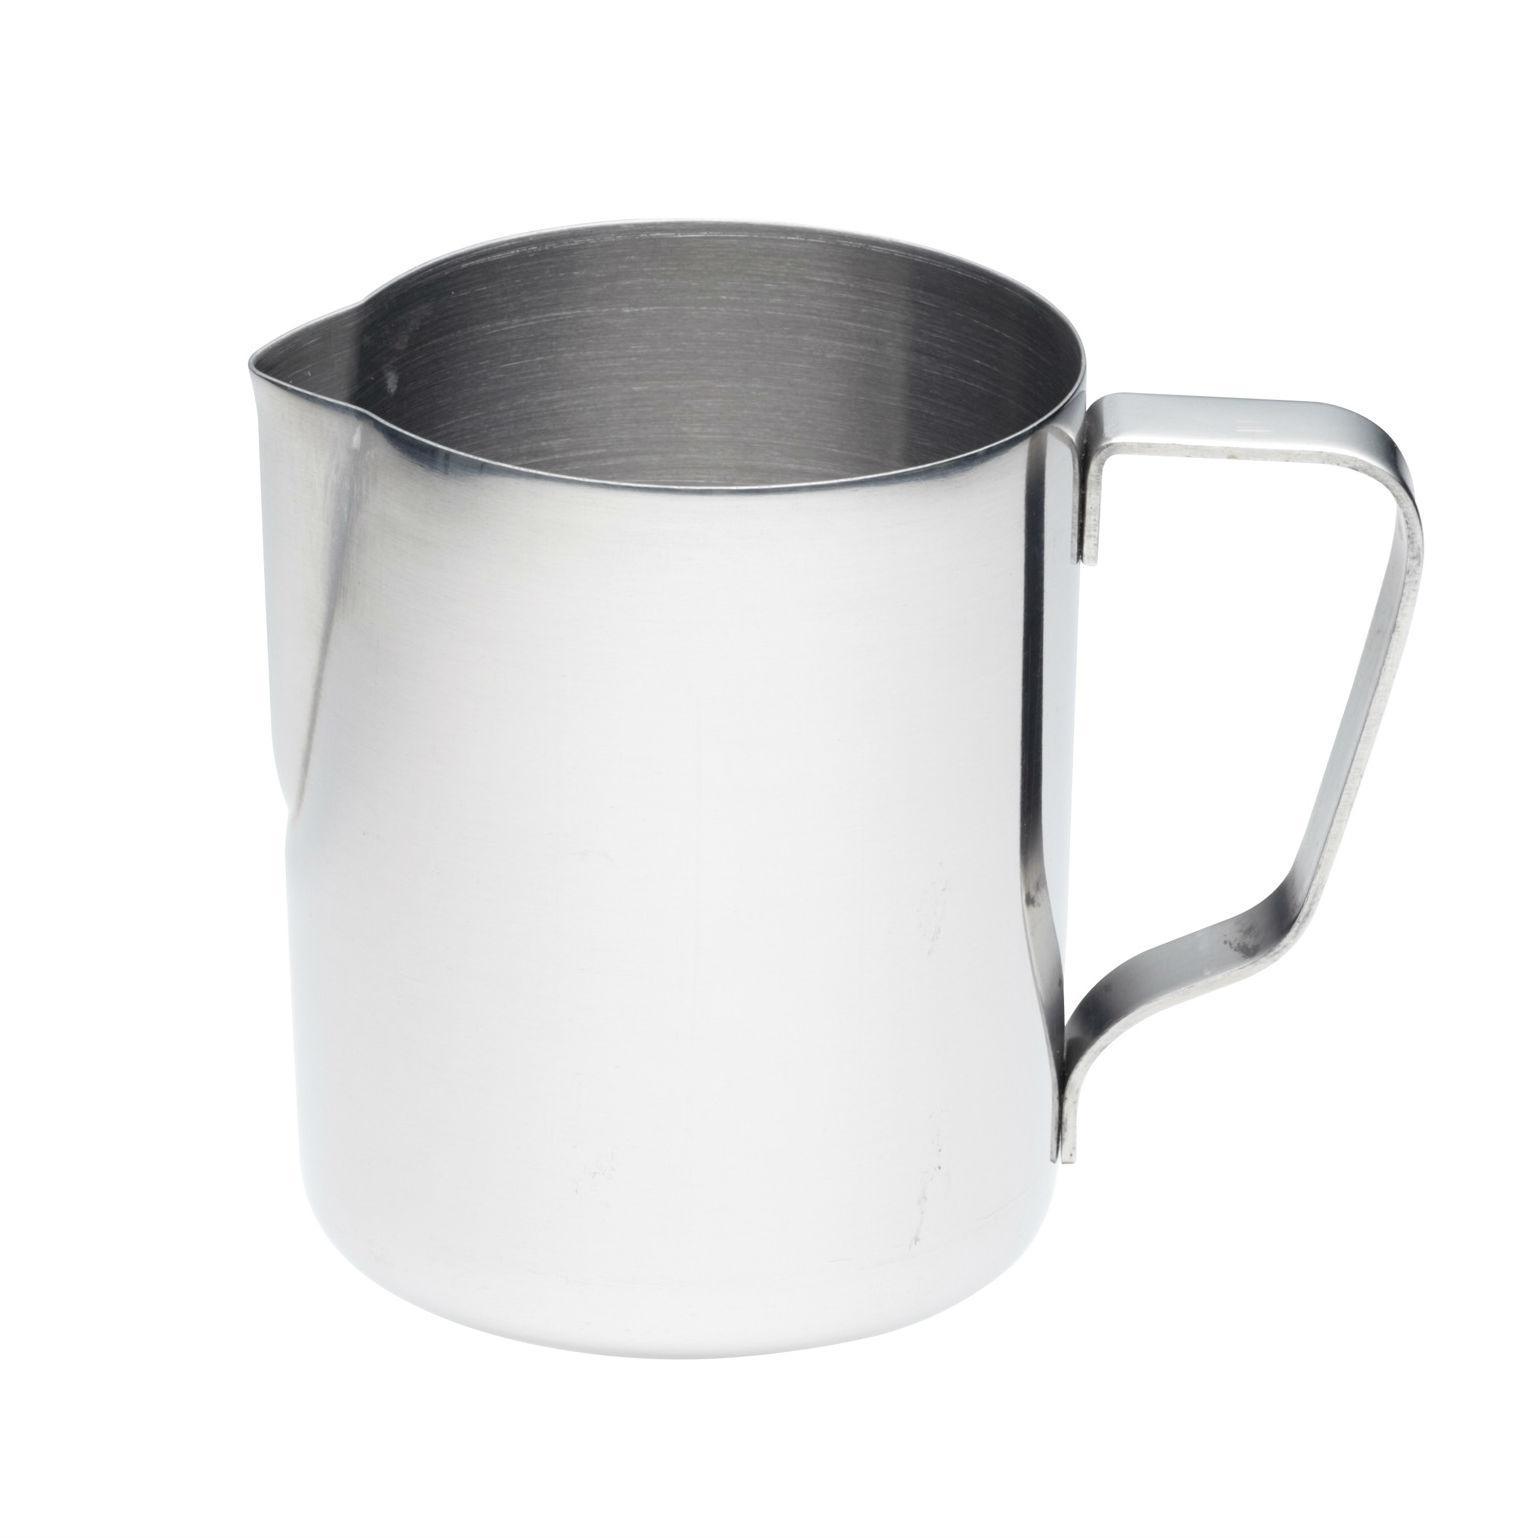 kitchencraft small stainless steel milk jug frothing jug. Black Bedroom Furniture Sets. Home Design Ideas